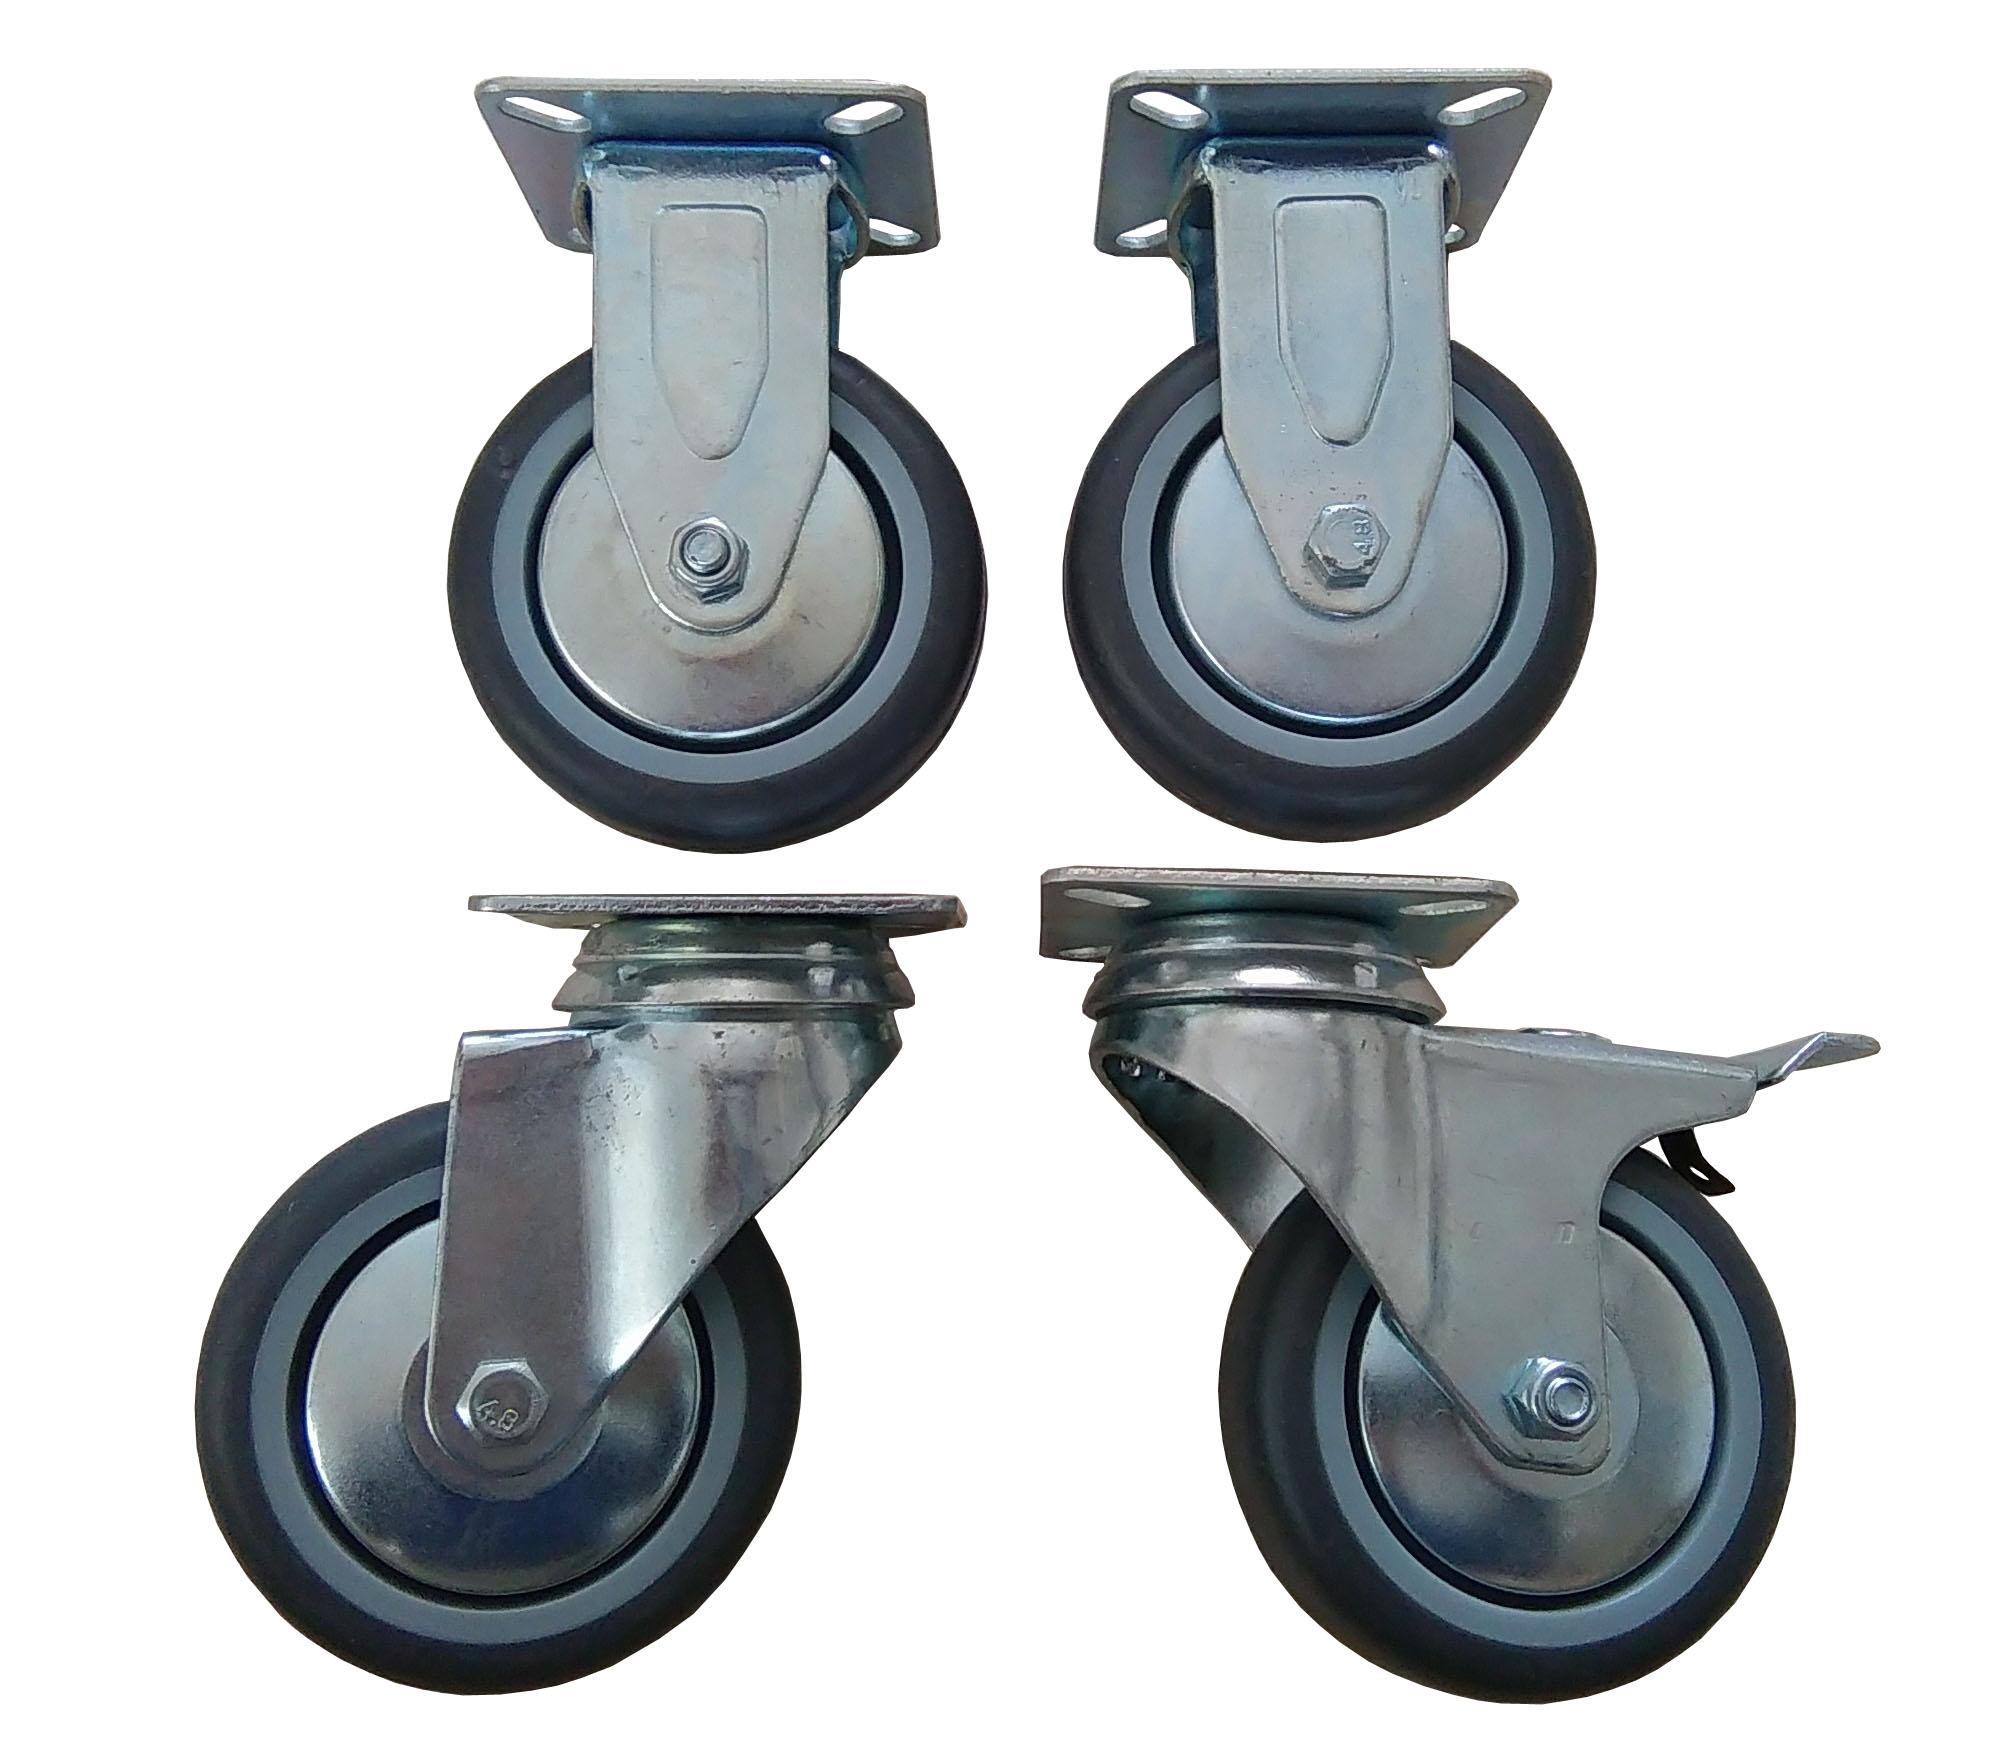 Kompletné 4 ks Kruh kolesa kolesa 75 mm 400 kg.